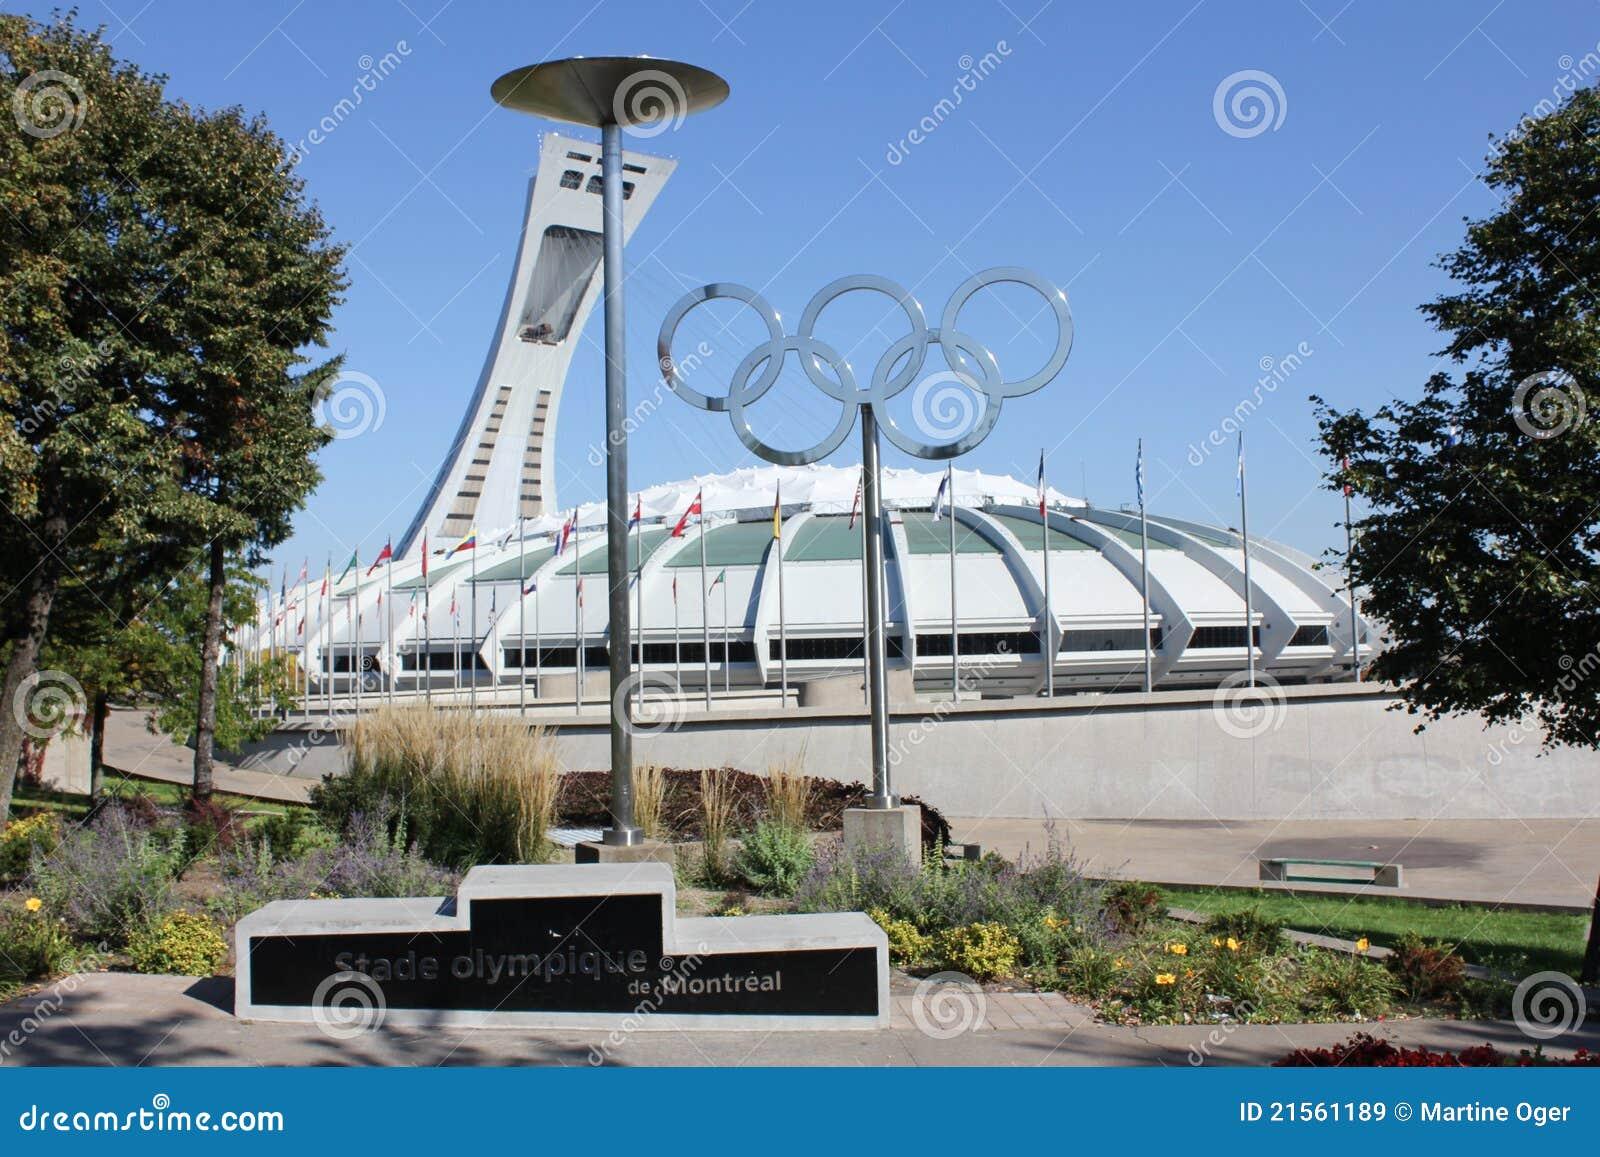 Stadio olimpico di Montreal.